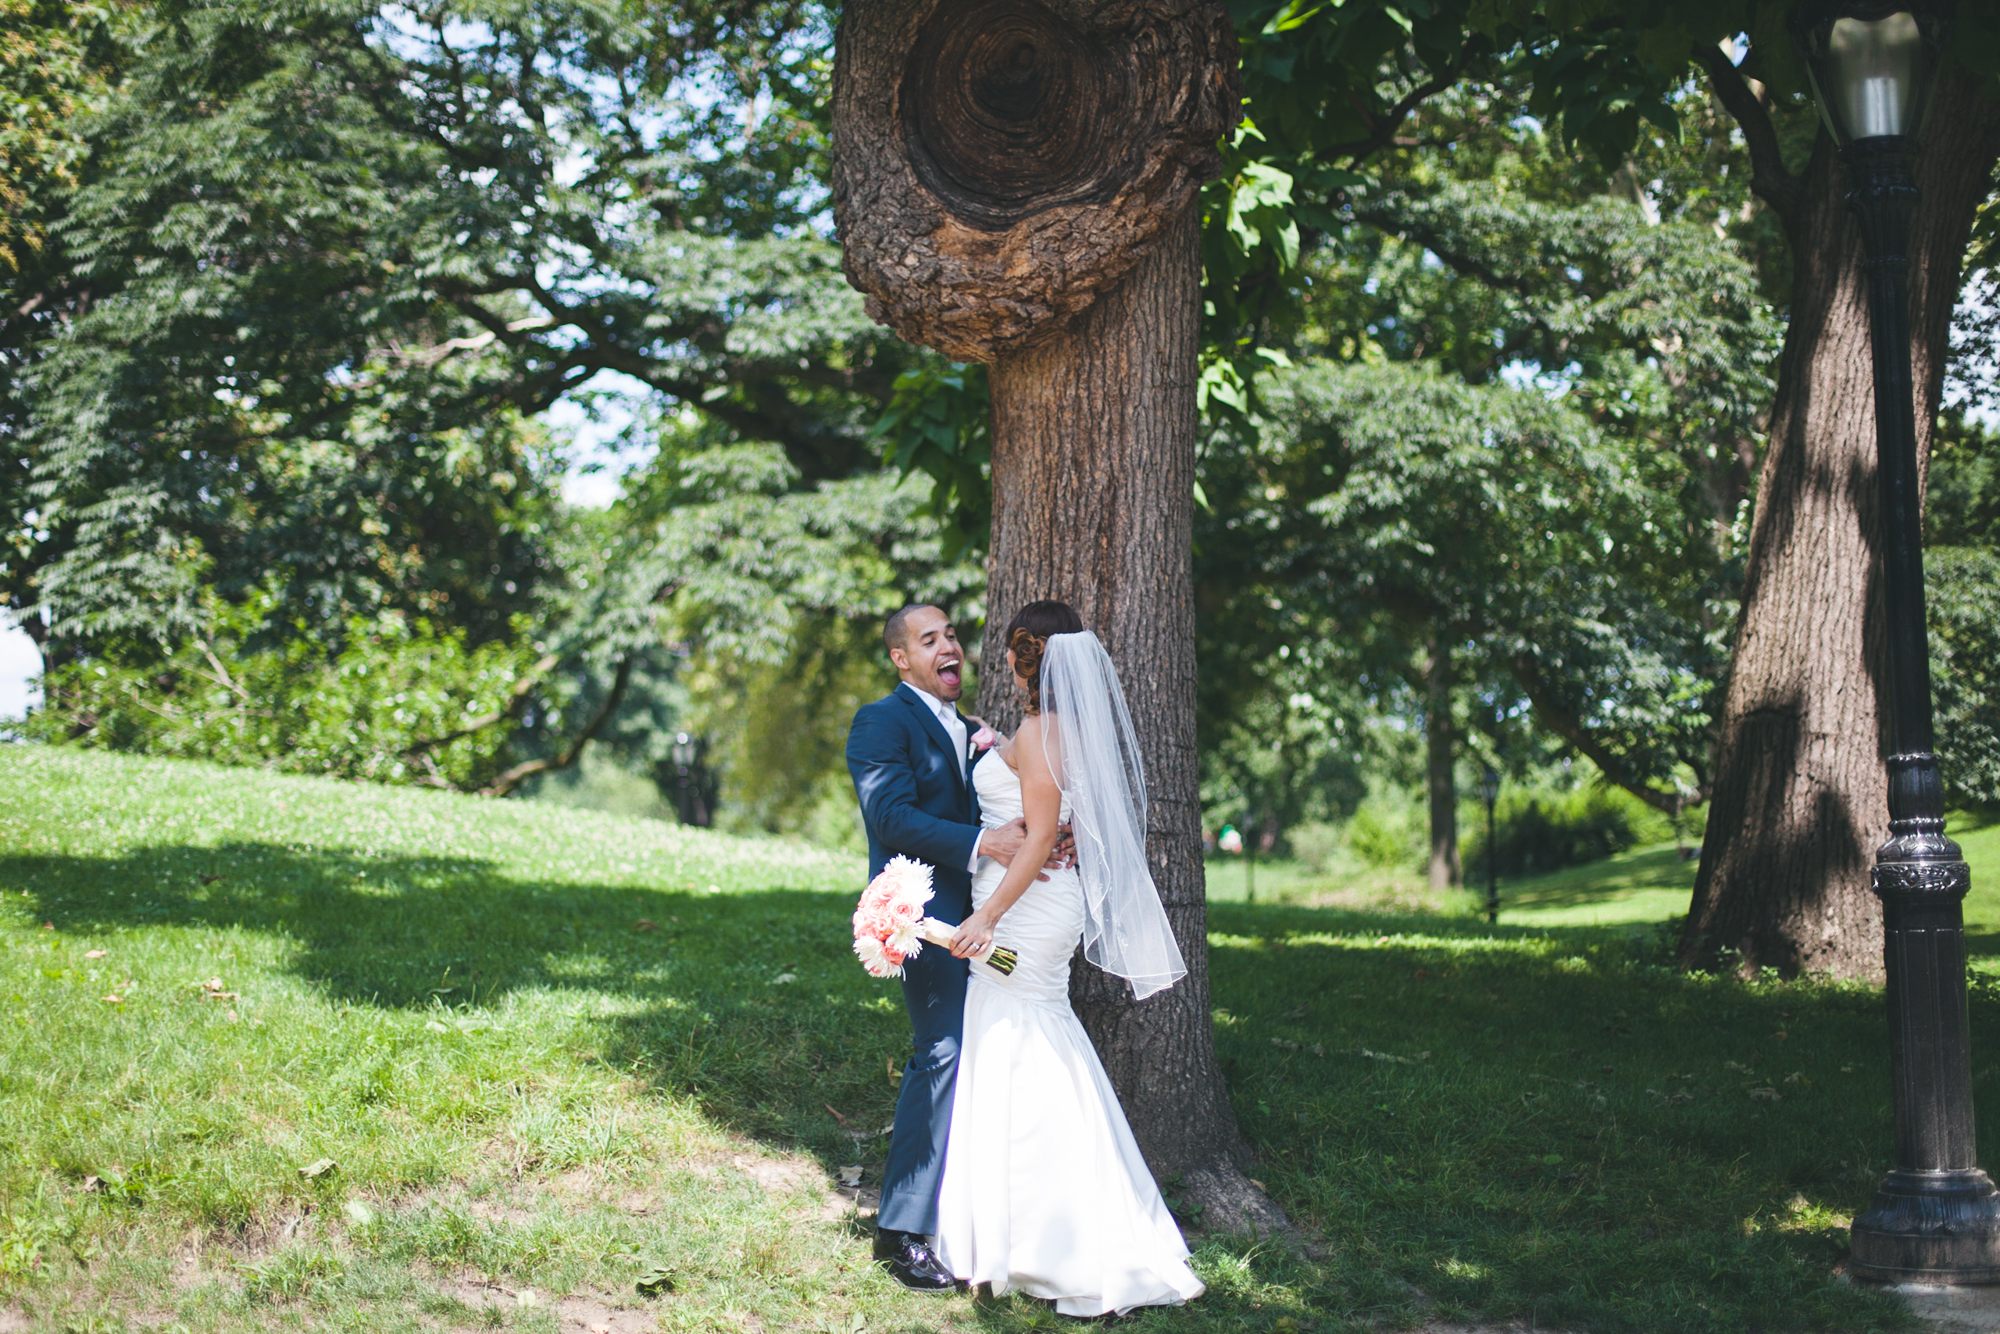 PriscillaJeffrey-Central-Park-Wedding-Elopement-Photography-NYC-42.jpg